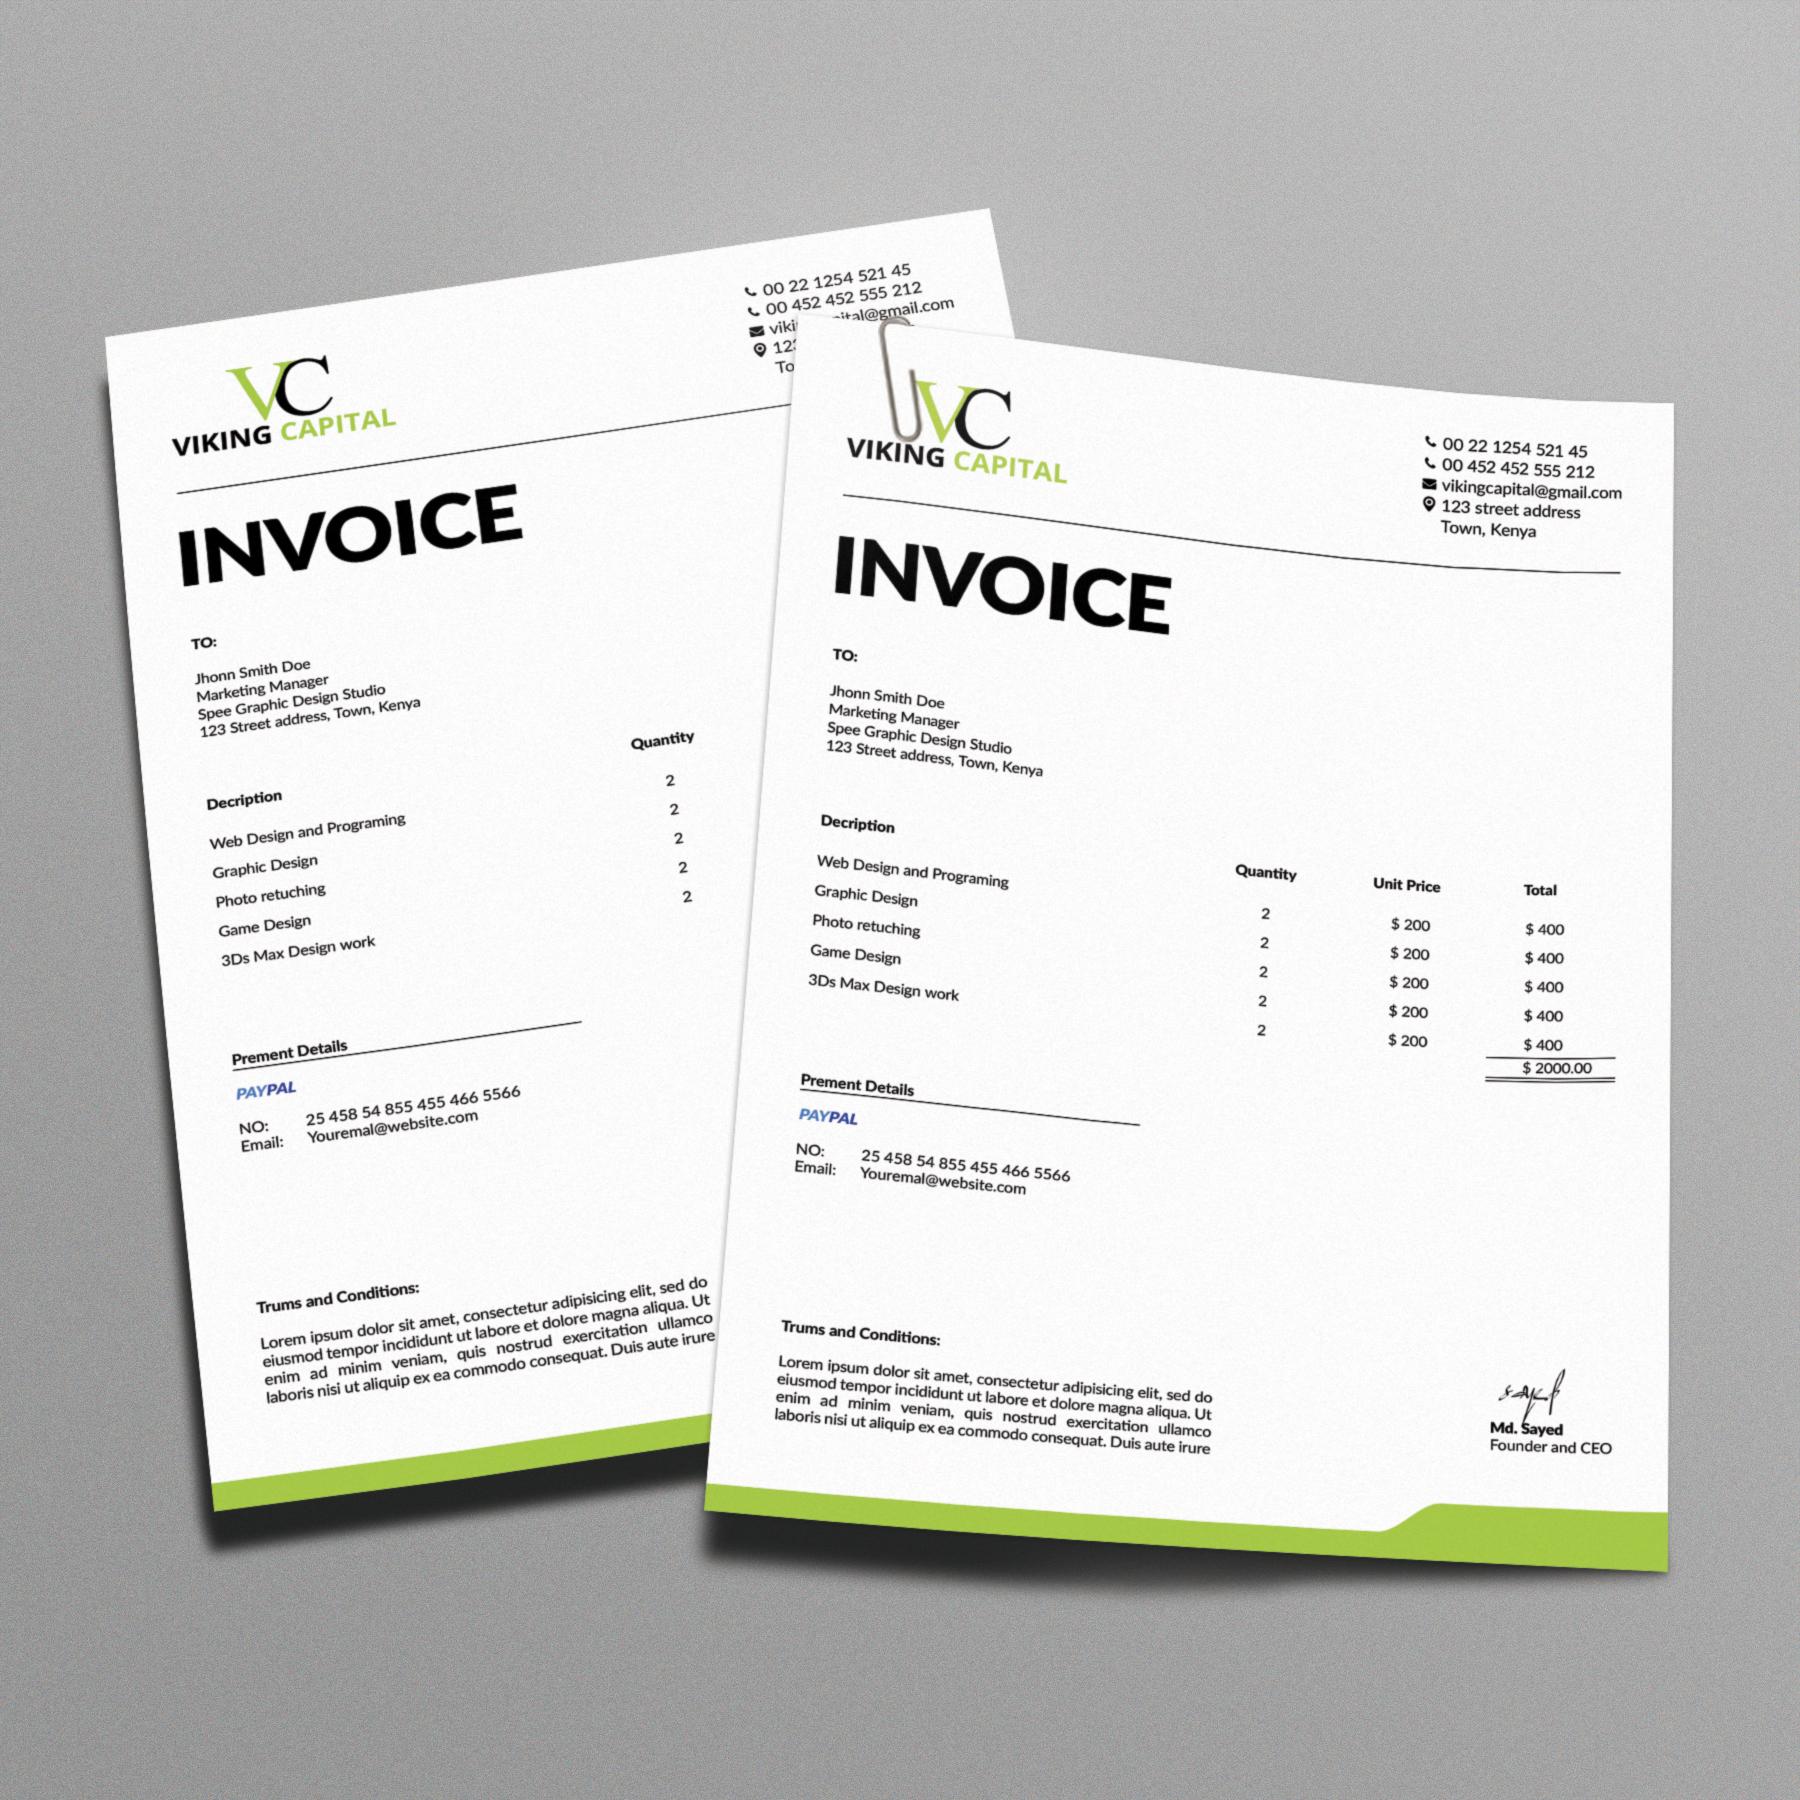 Minimalist Invoice Template On Behance  Invoice Designs